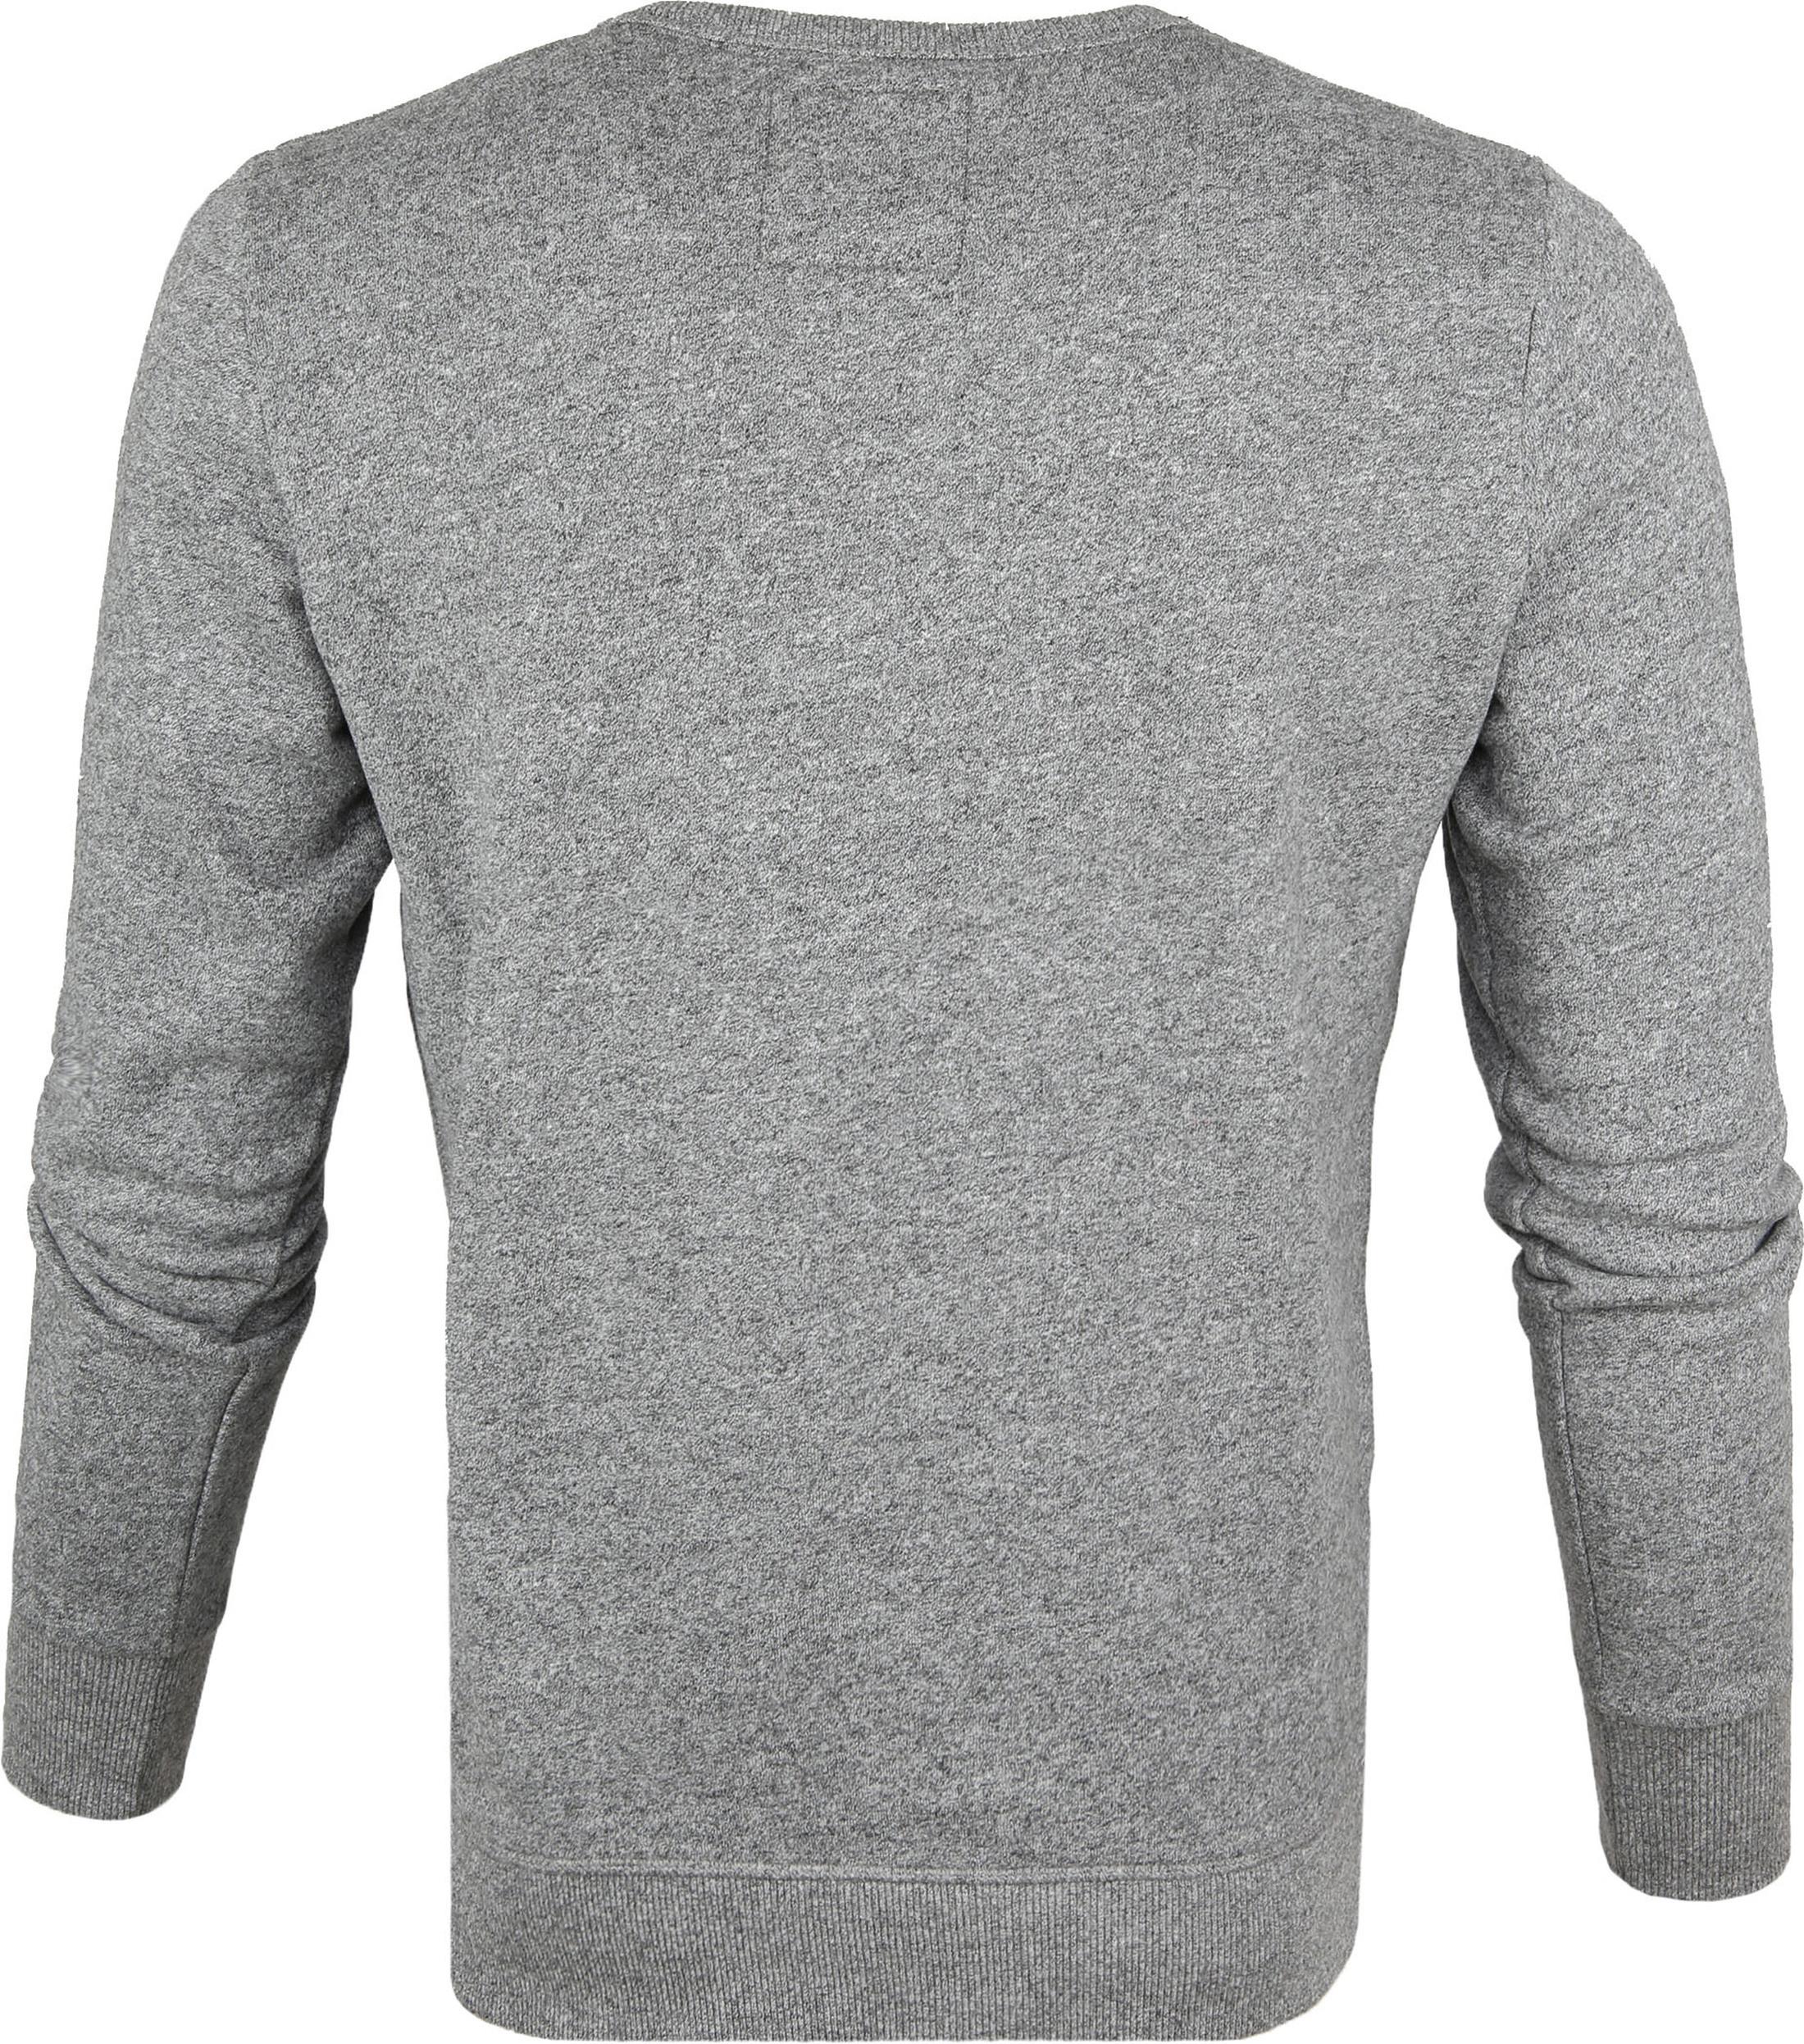 Superdry Sweater Melange Grijs foto 2